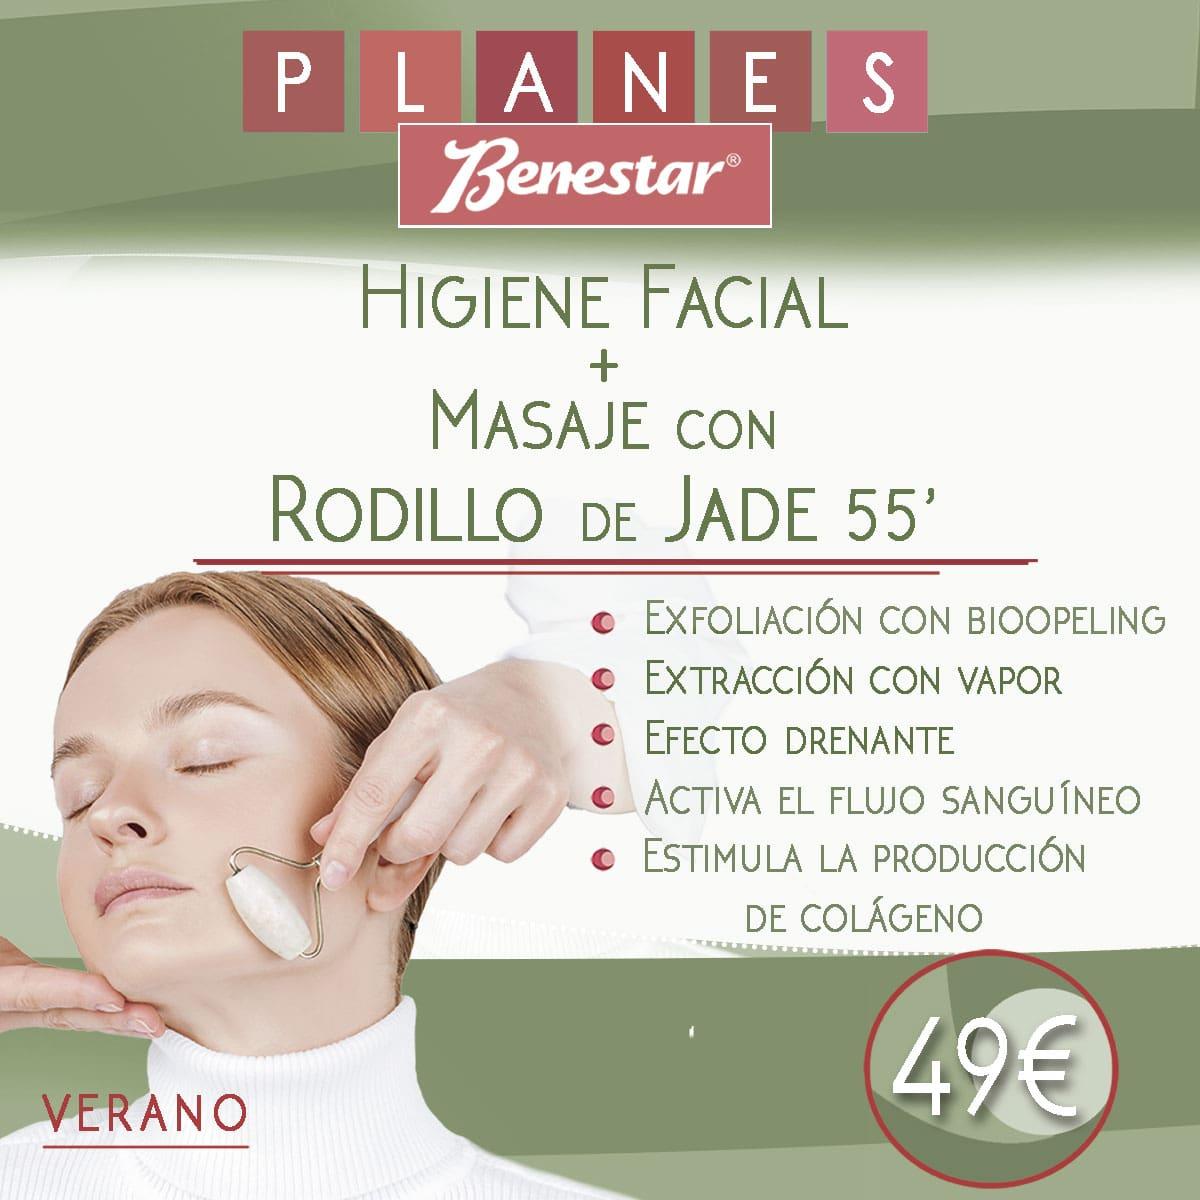 centro-estetica-benestar-higiene-facial-masaje-rodillo-jade